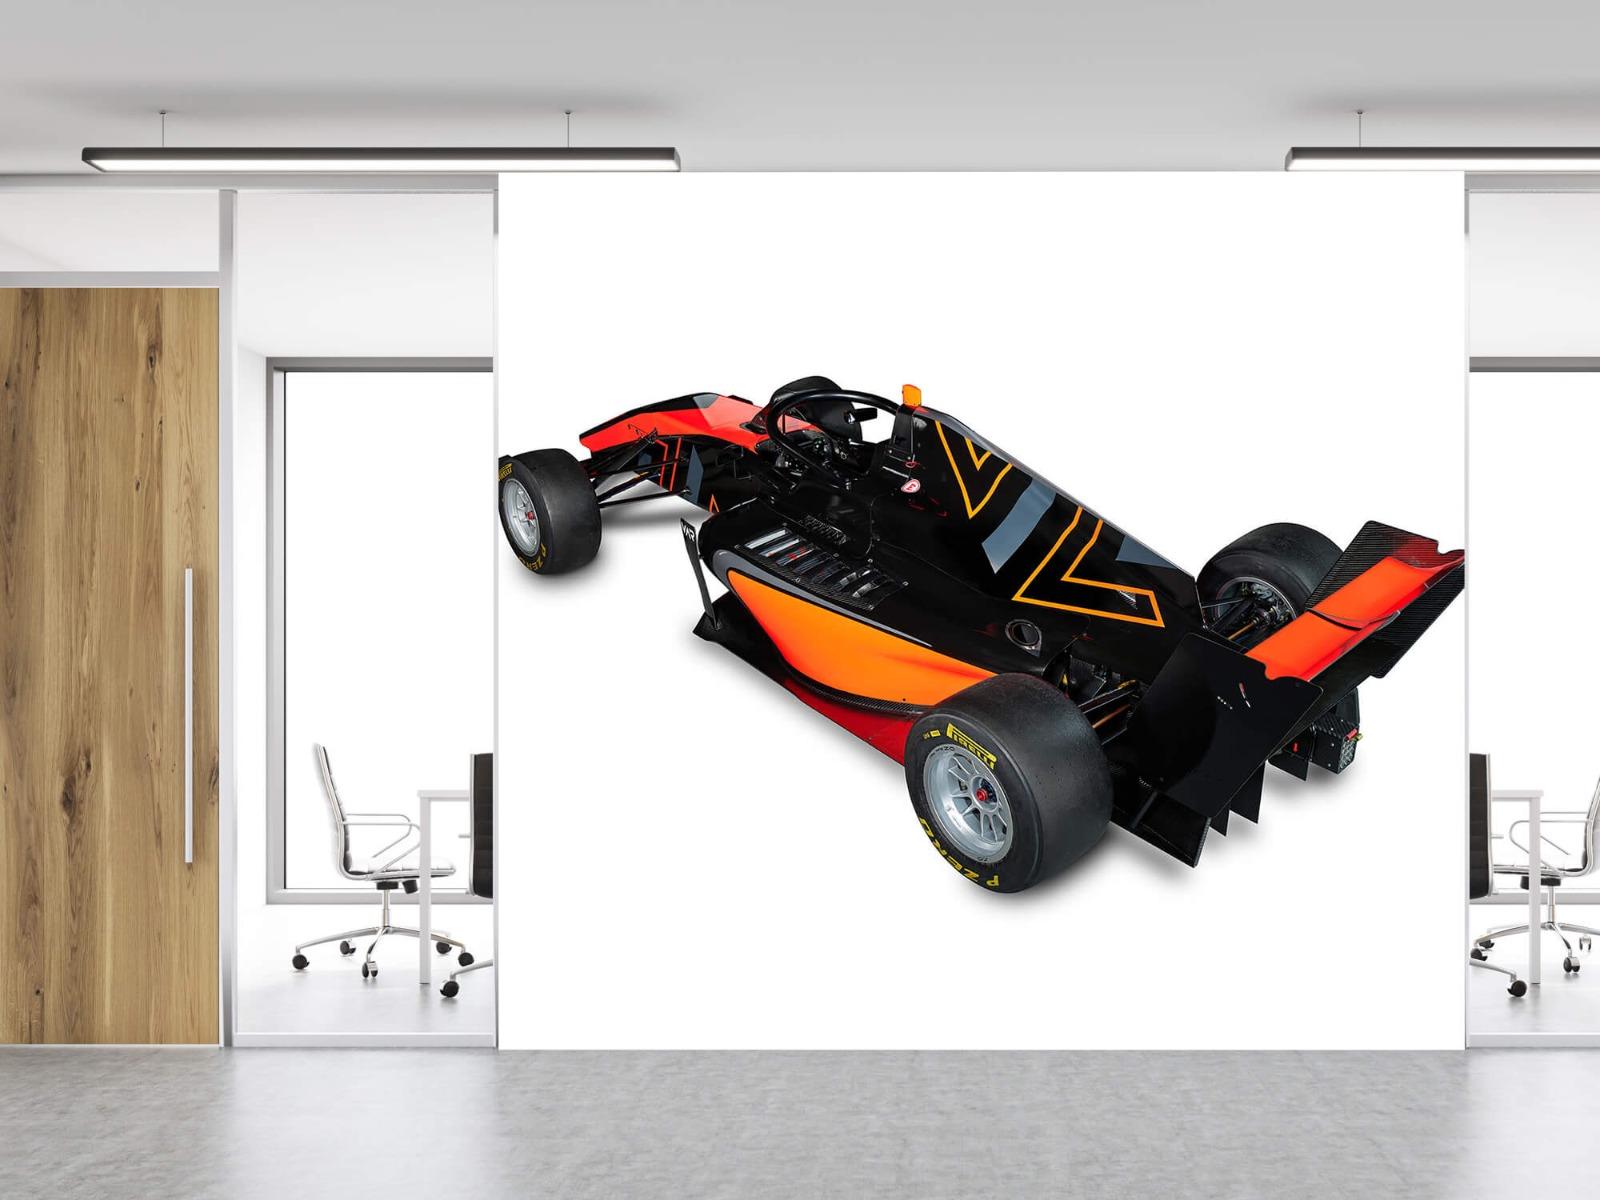 Sportauto's - Formula 3 - Rear left view - Hobbykamer 11